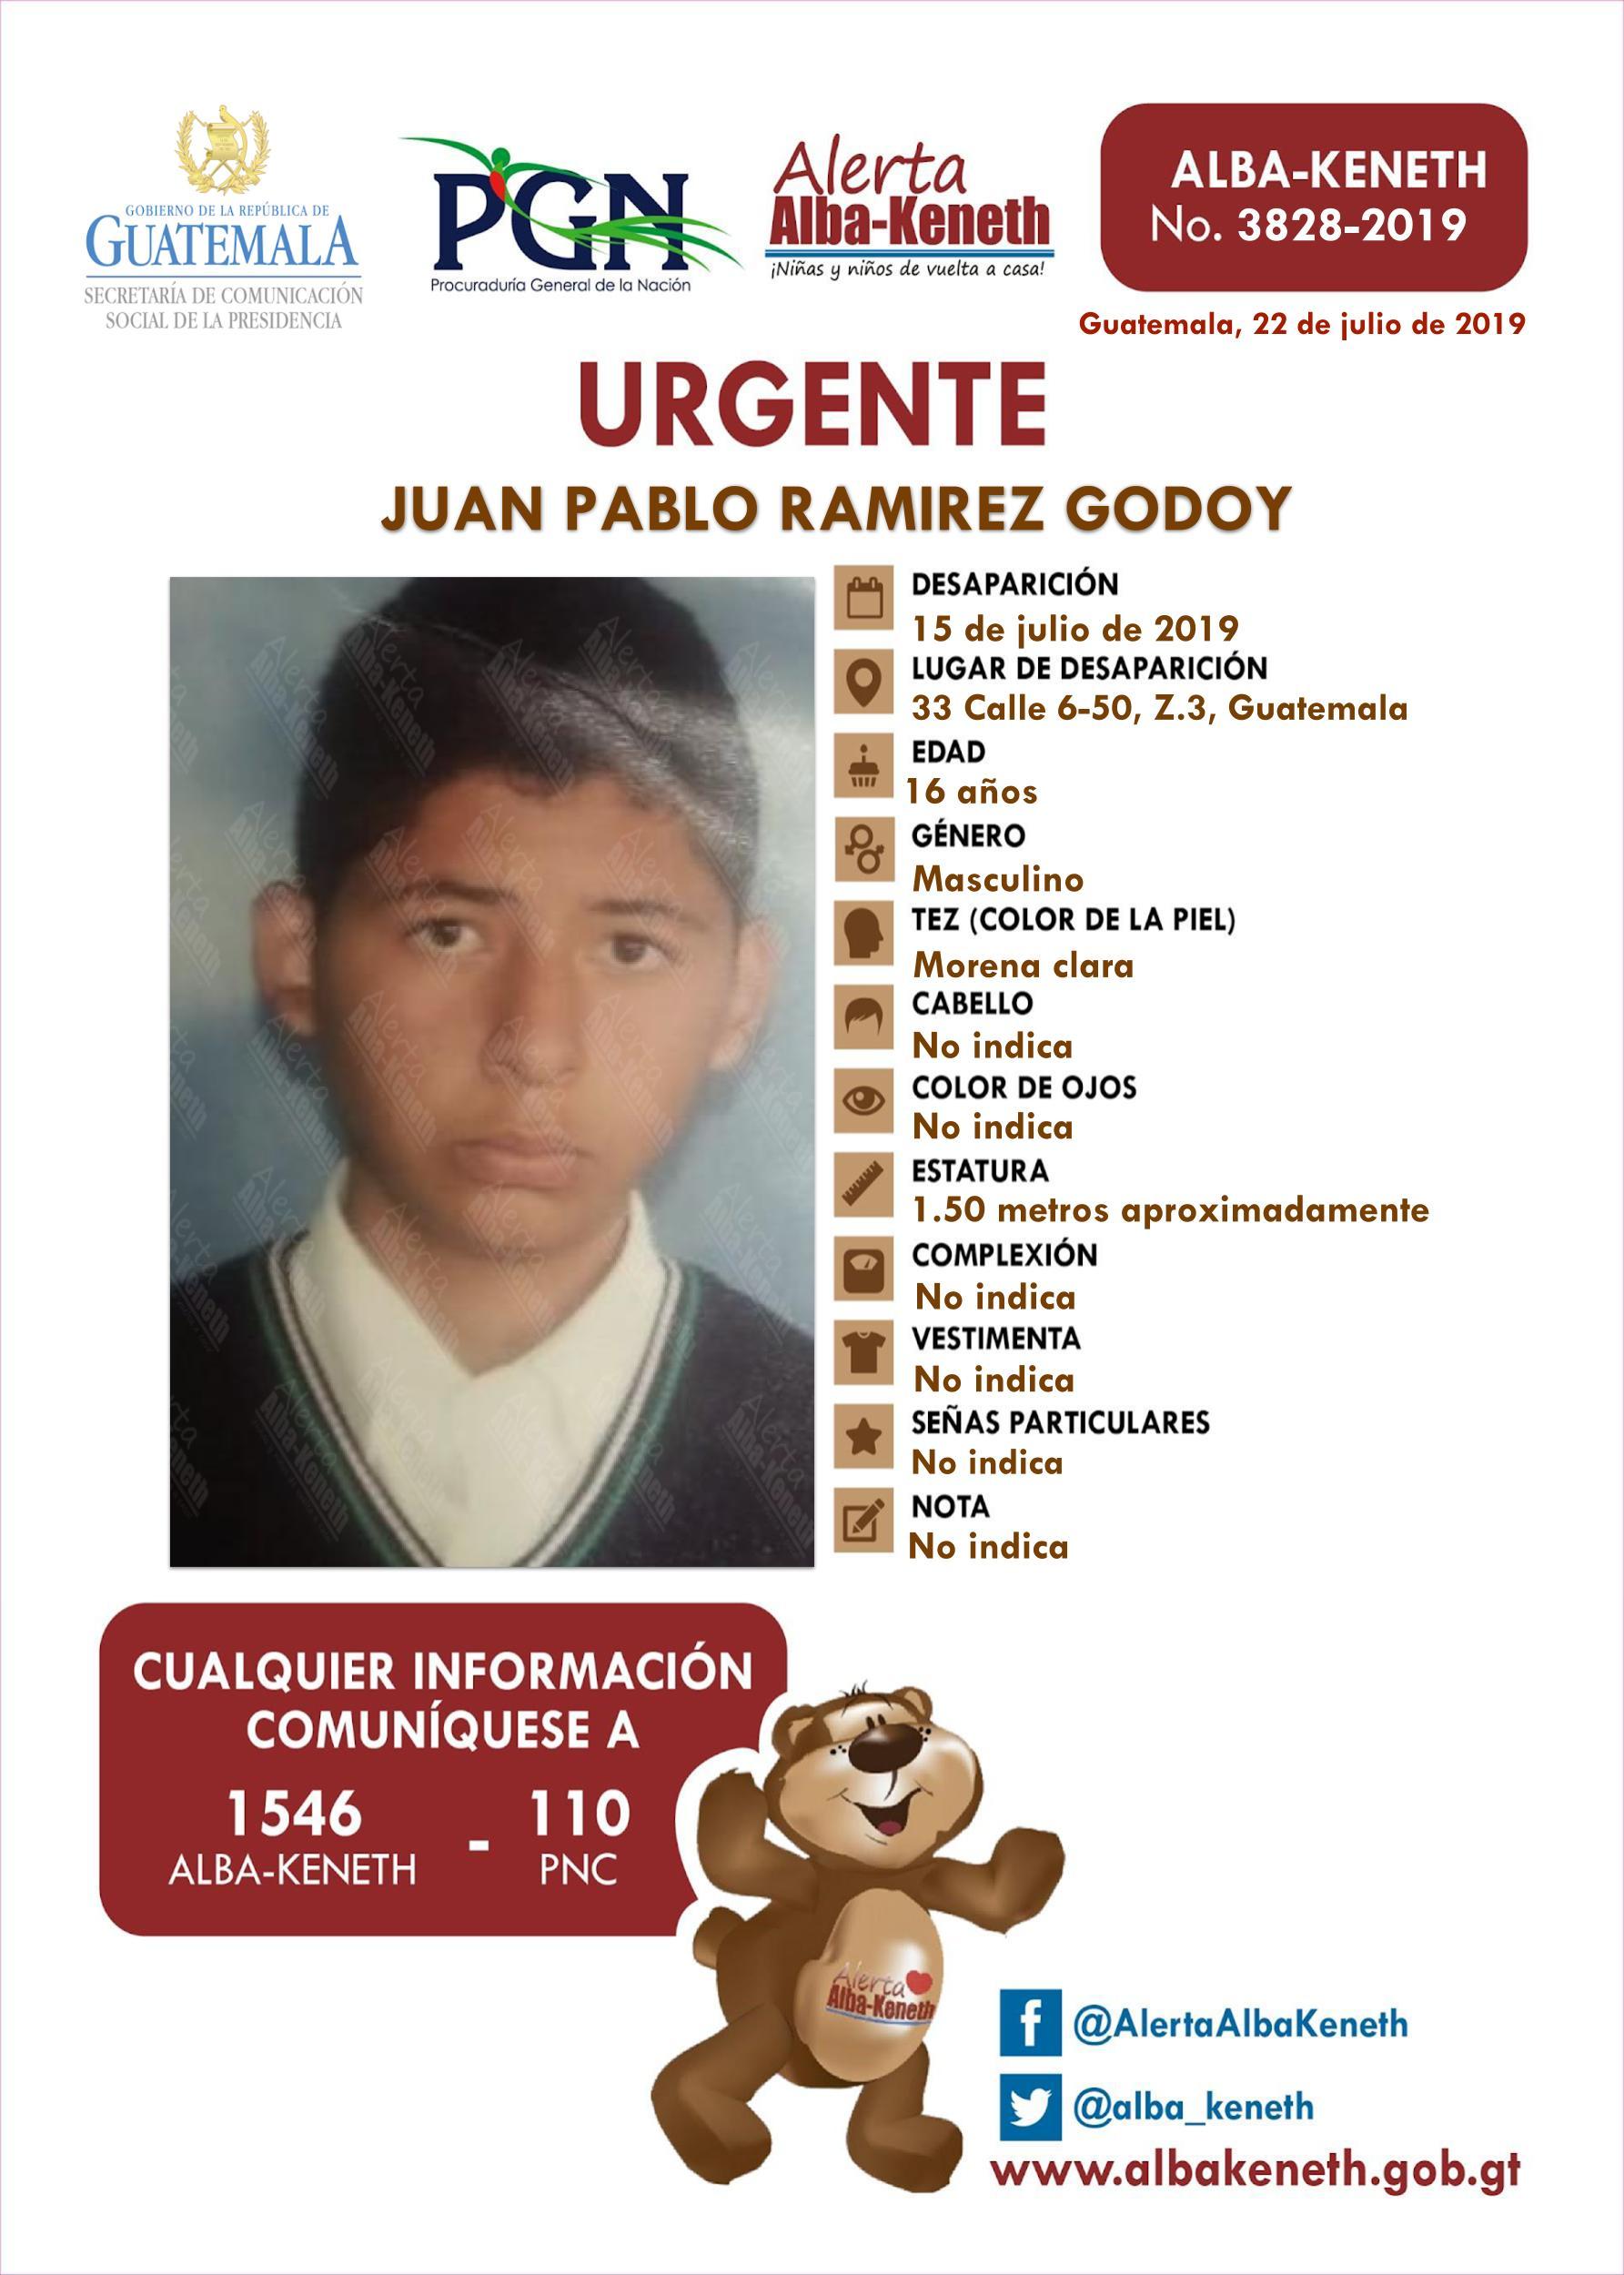 Juan Pablo Ramirez Godoy